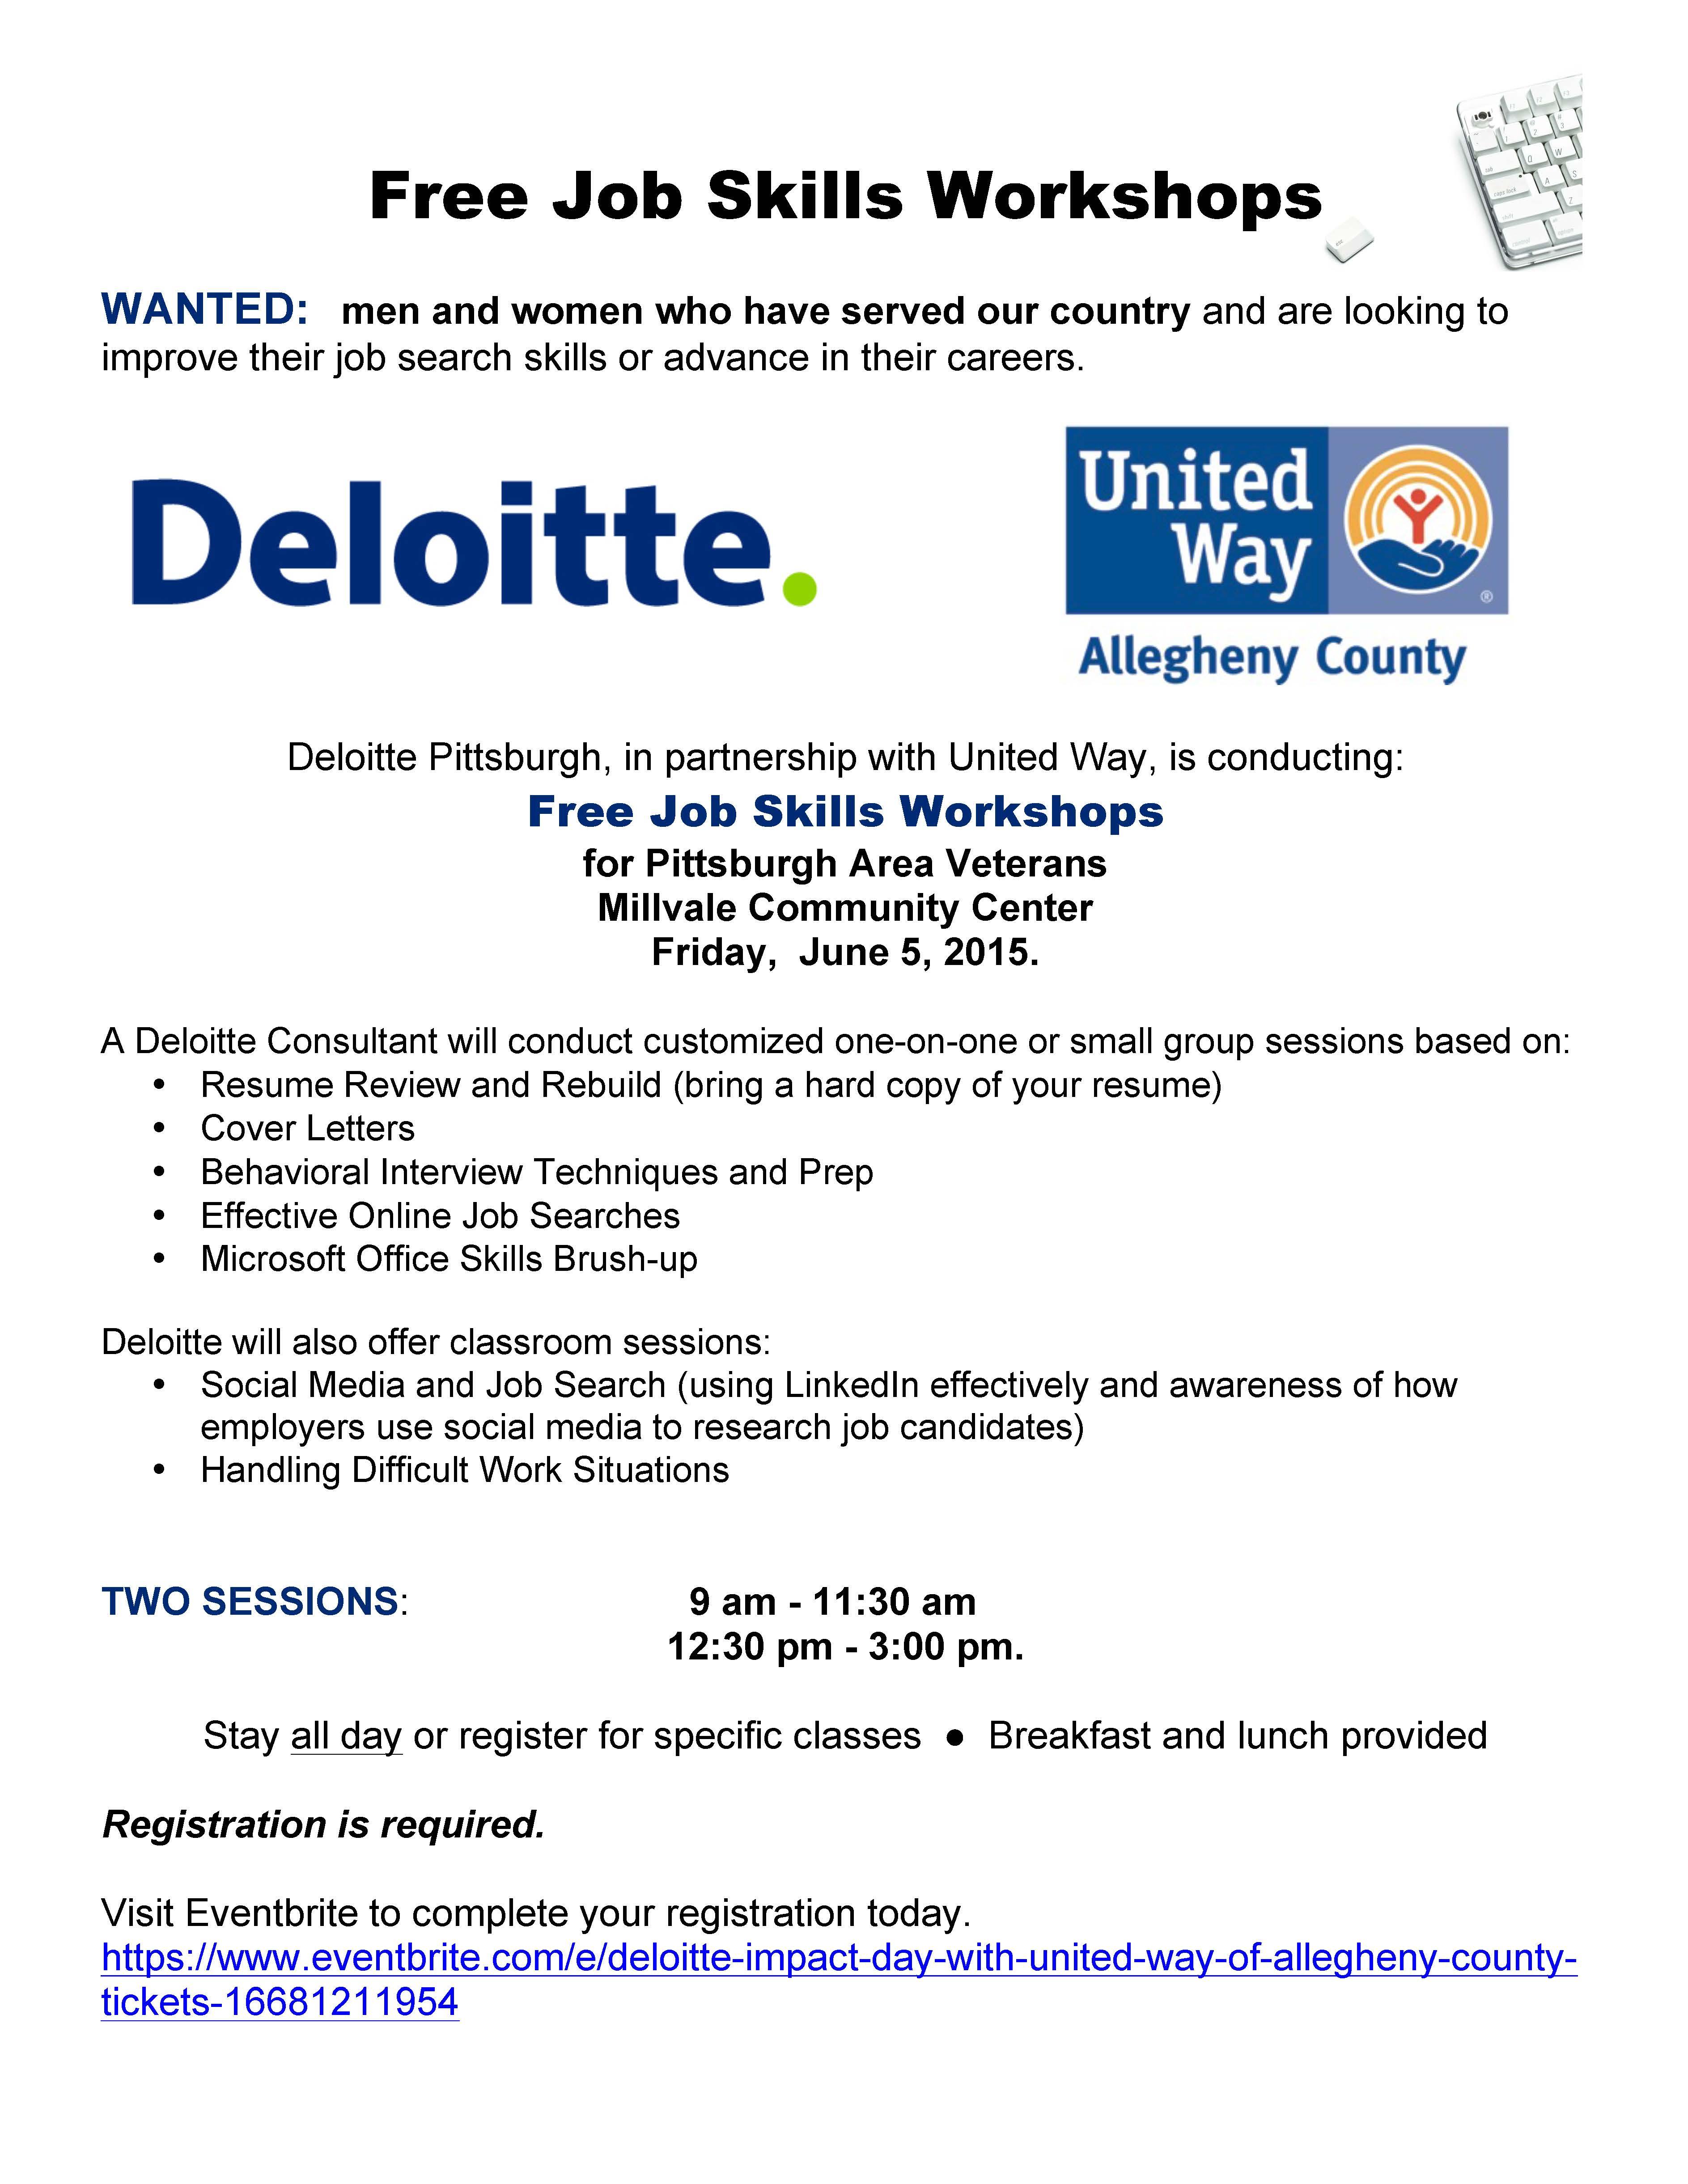 Free Job Skills Workshops for Pittsburgh Area Veterans -